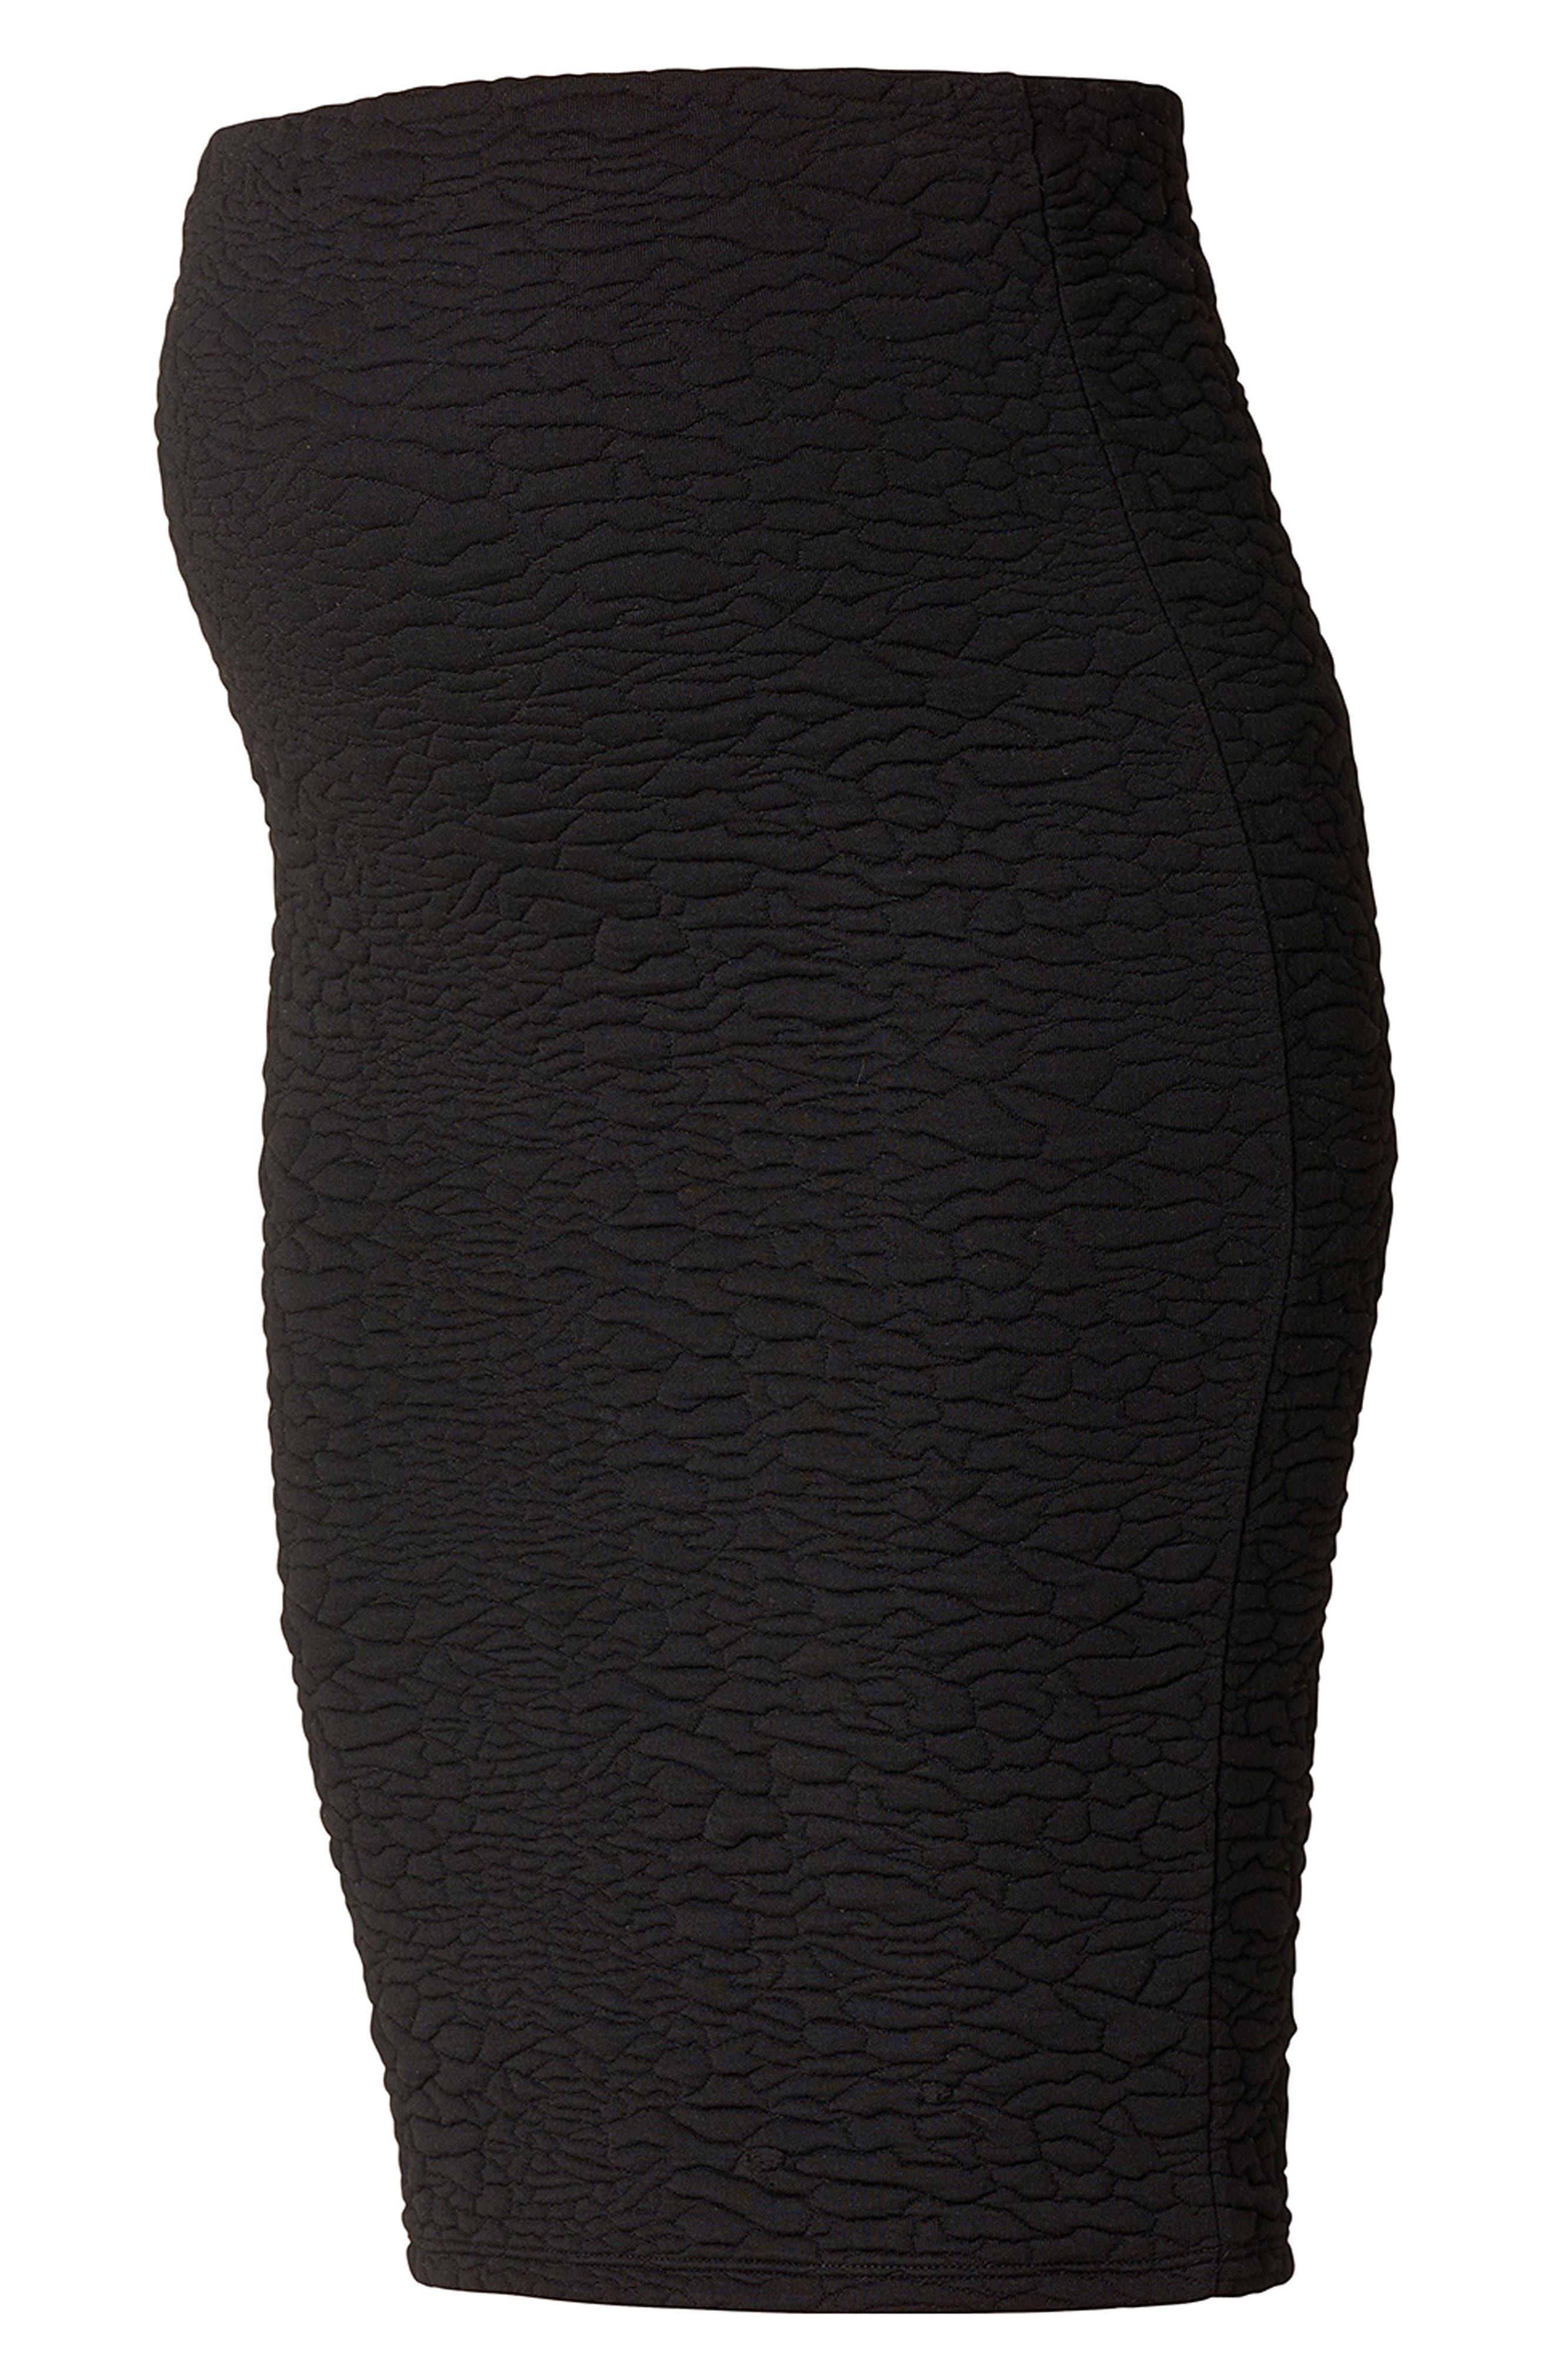 Alternate Image 4  - Noppies Jane Textured Knit Maternity Skirt